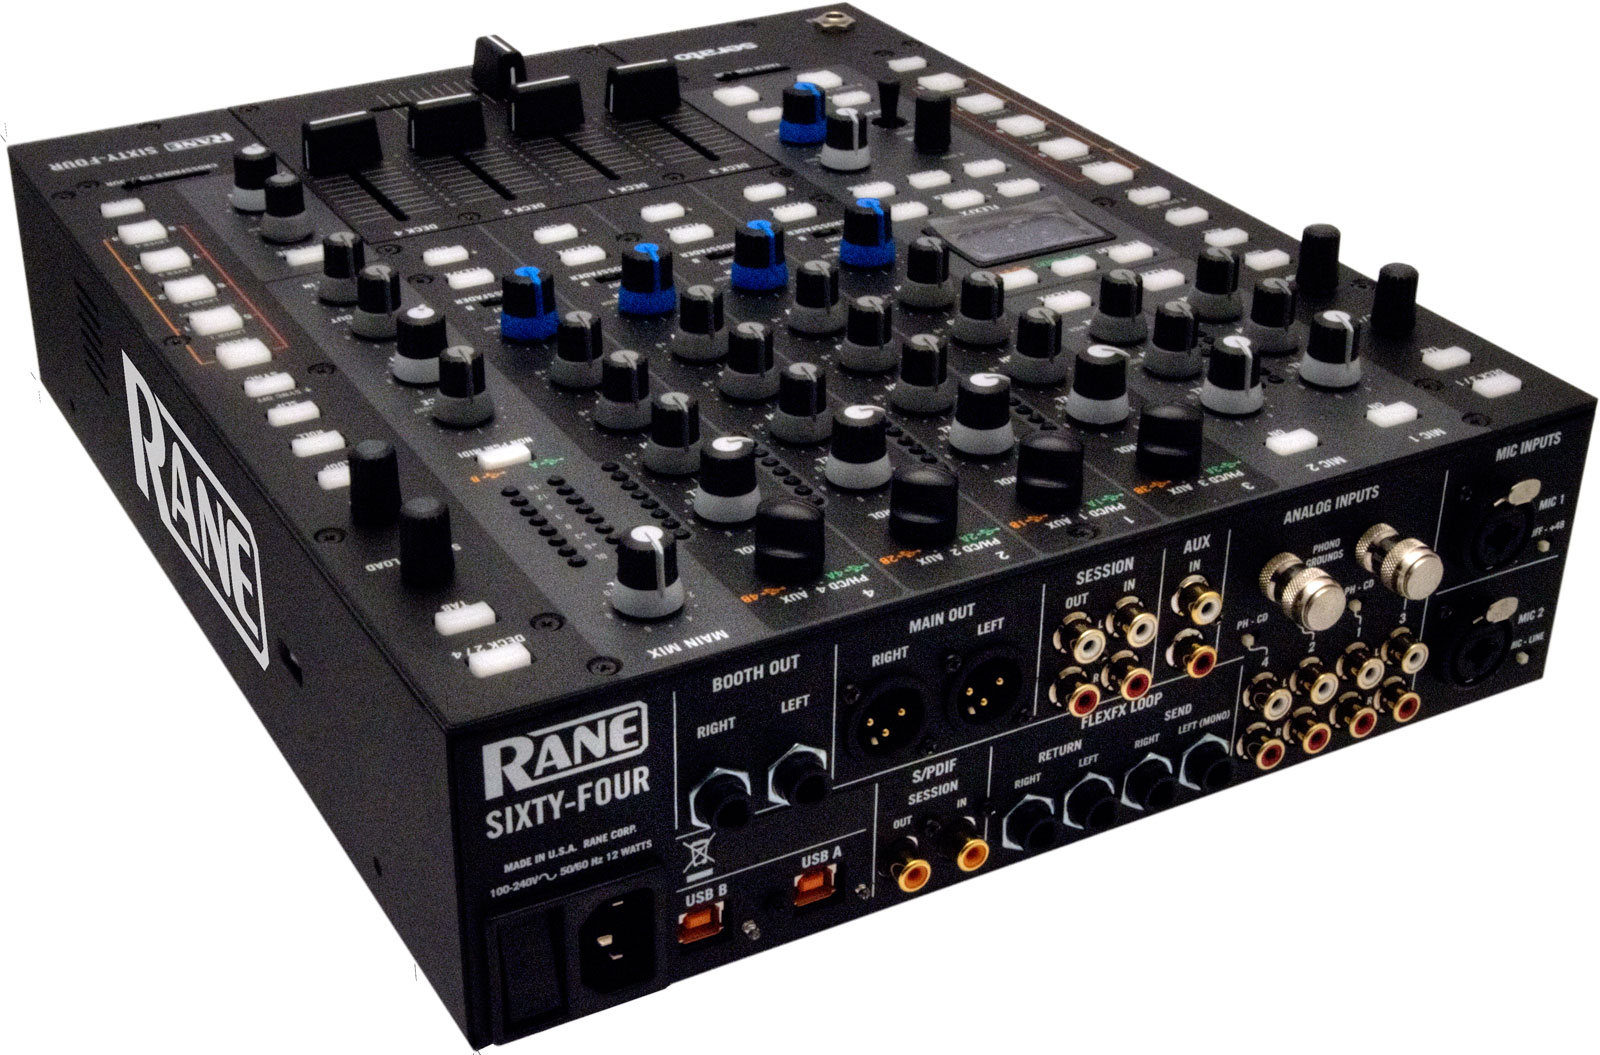 Rane Sixty Four Serato DJ – Systemrelevant